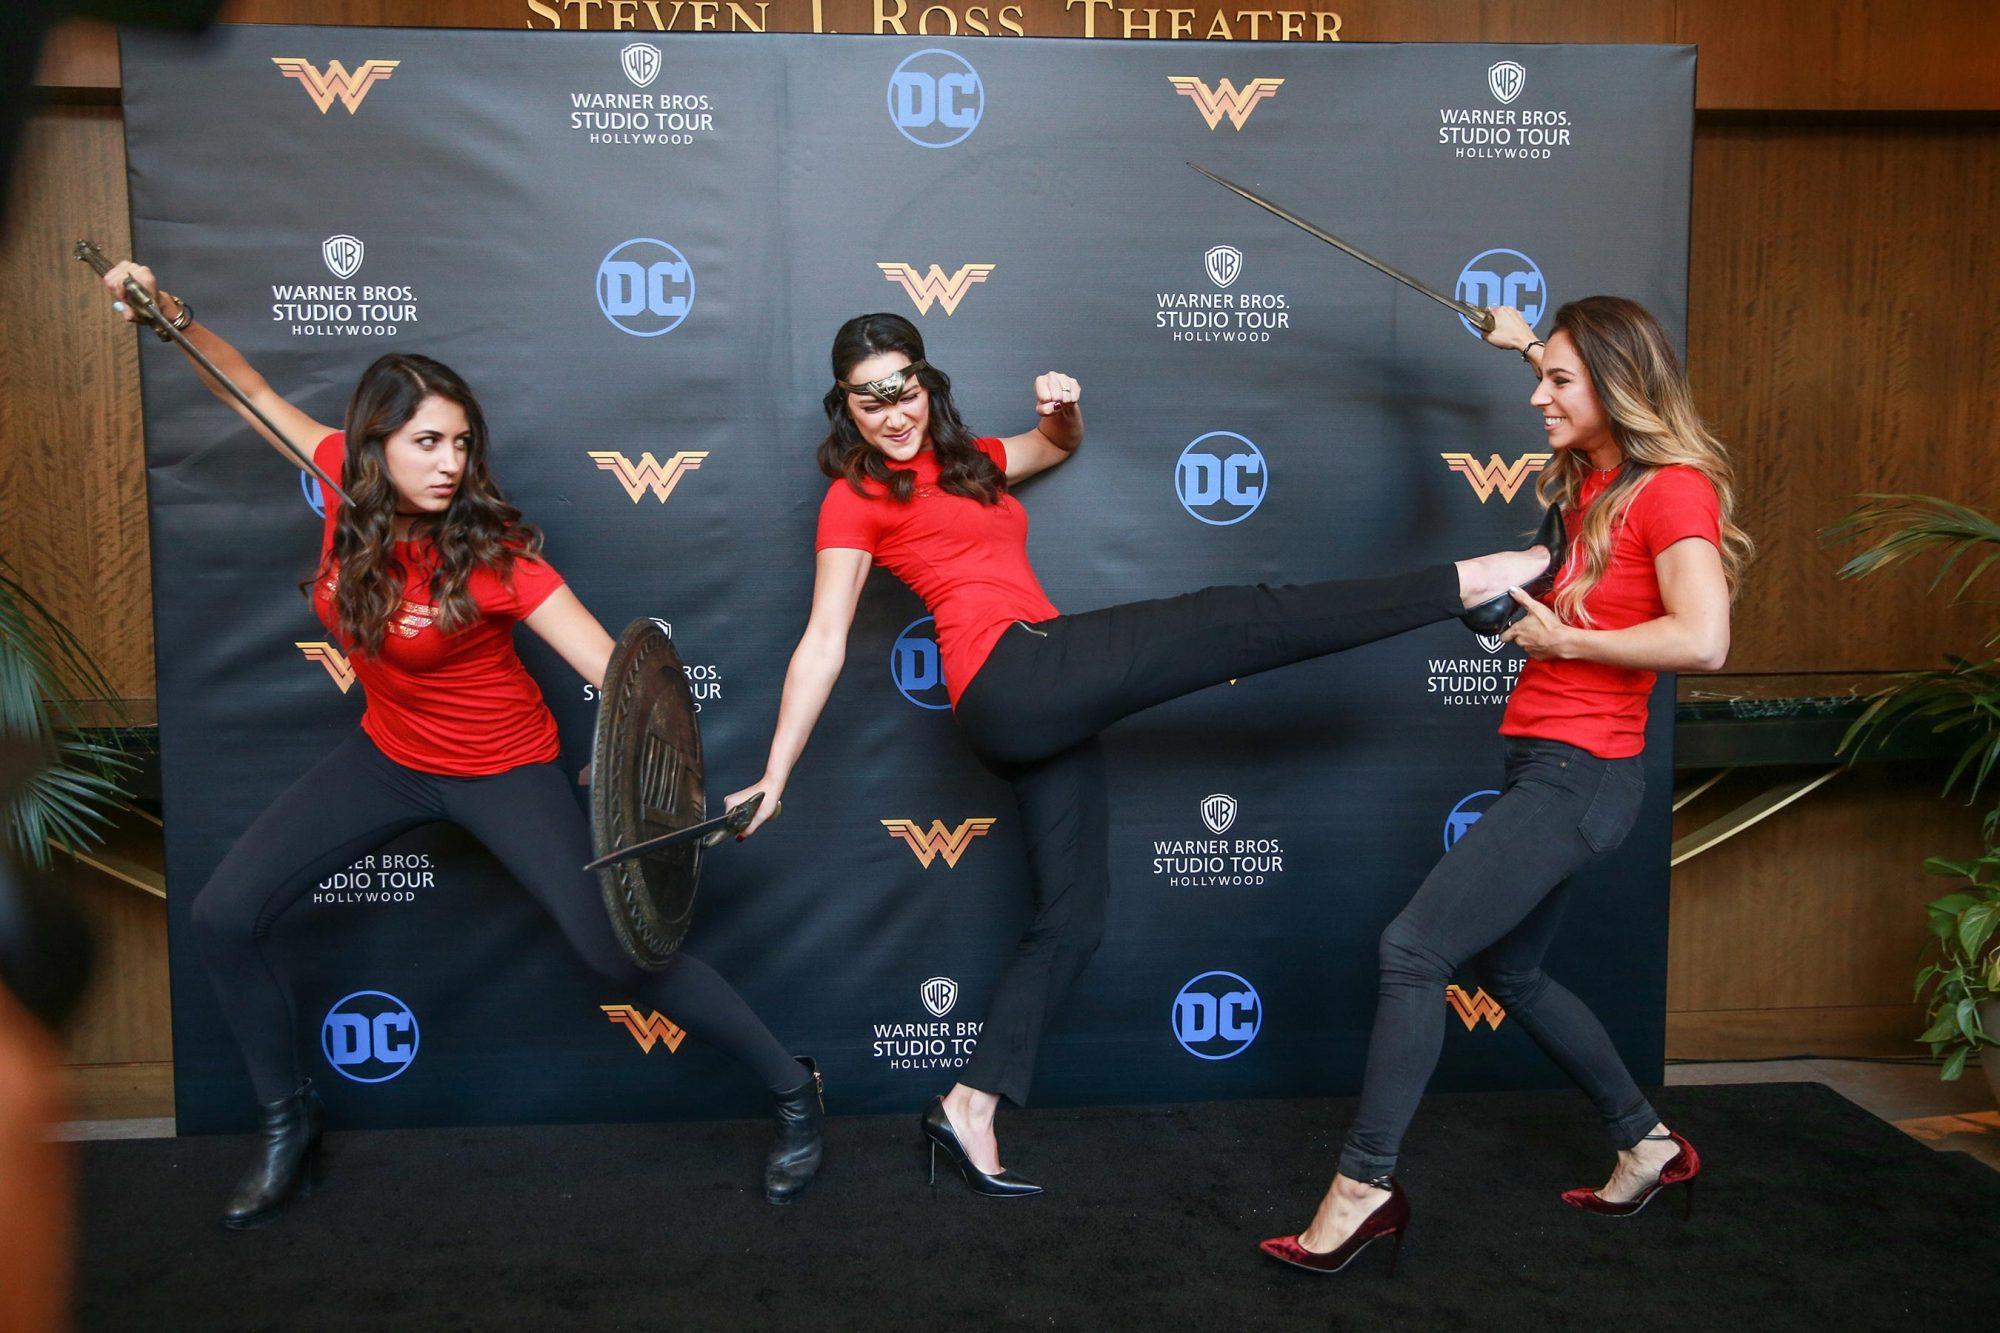 Warner Bros. Studio Tour Hollywood Adds Wonder Woman Exhibit to DC Universe: The Exhibit